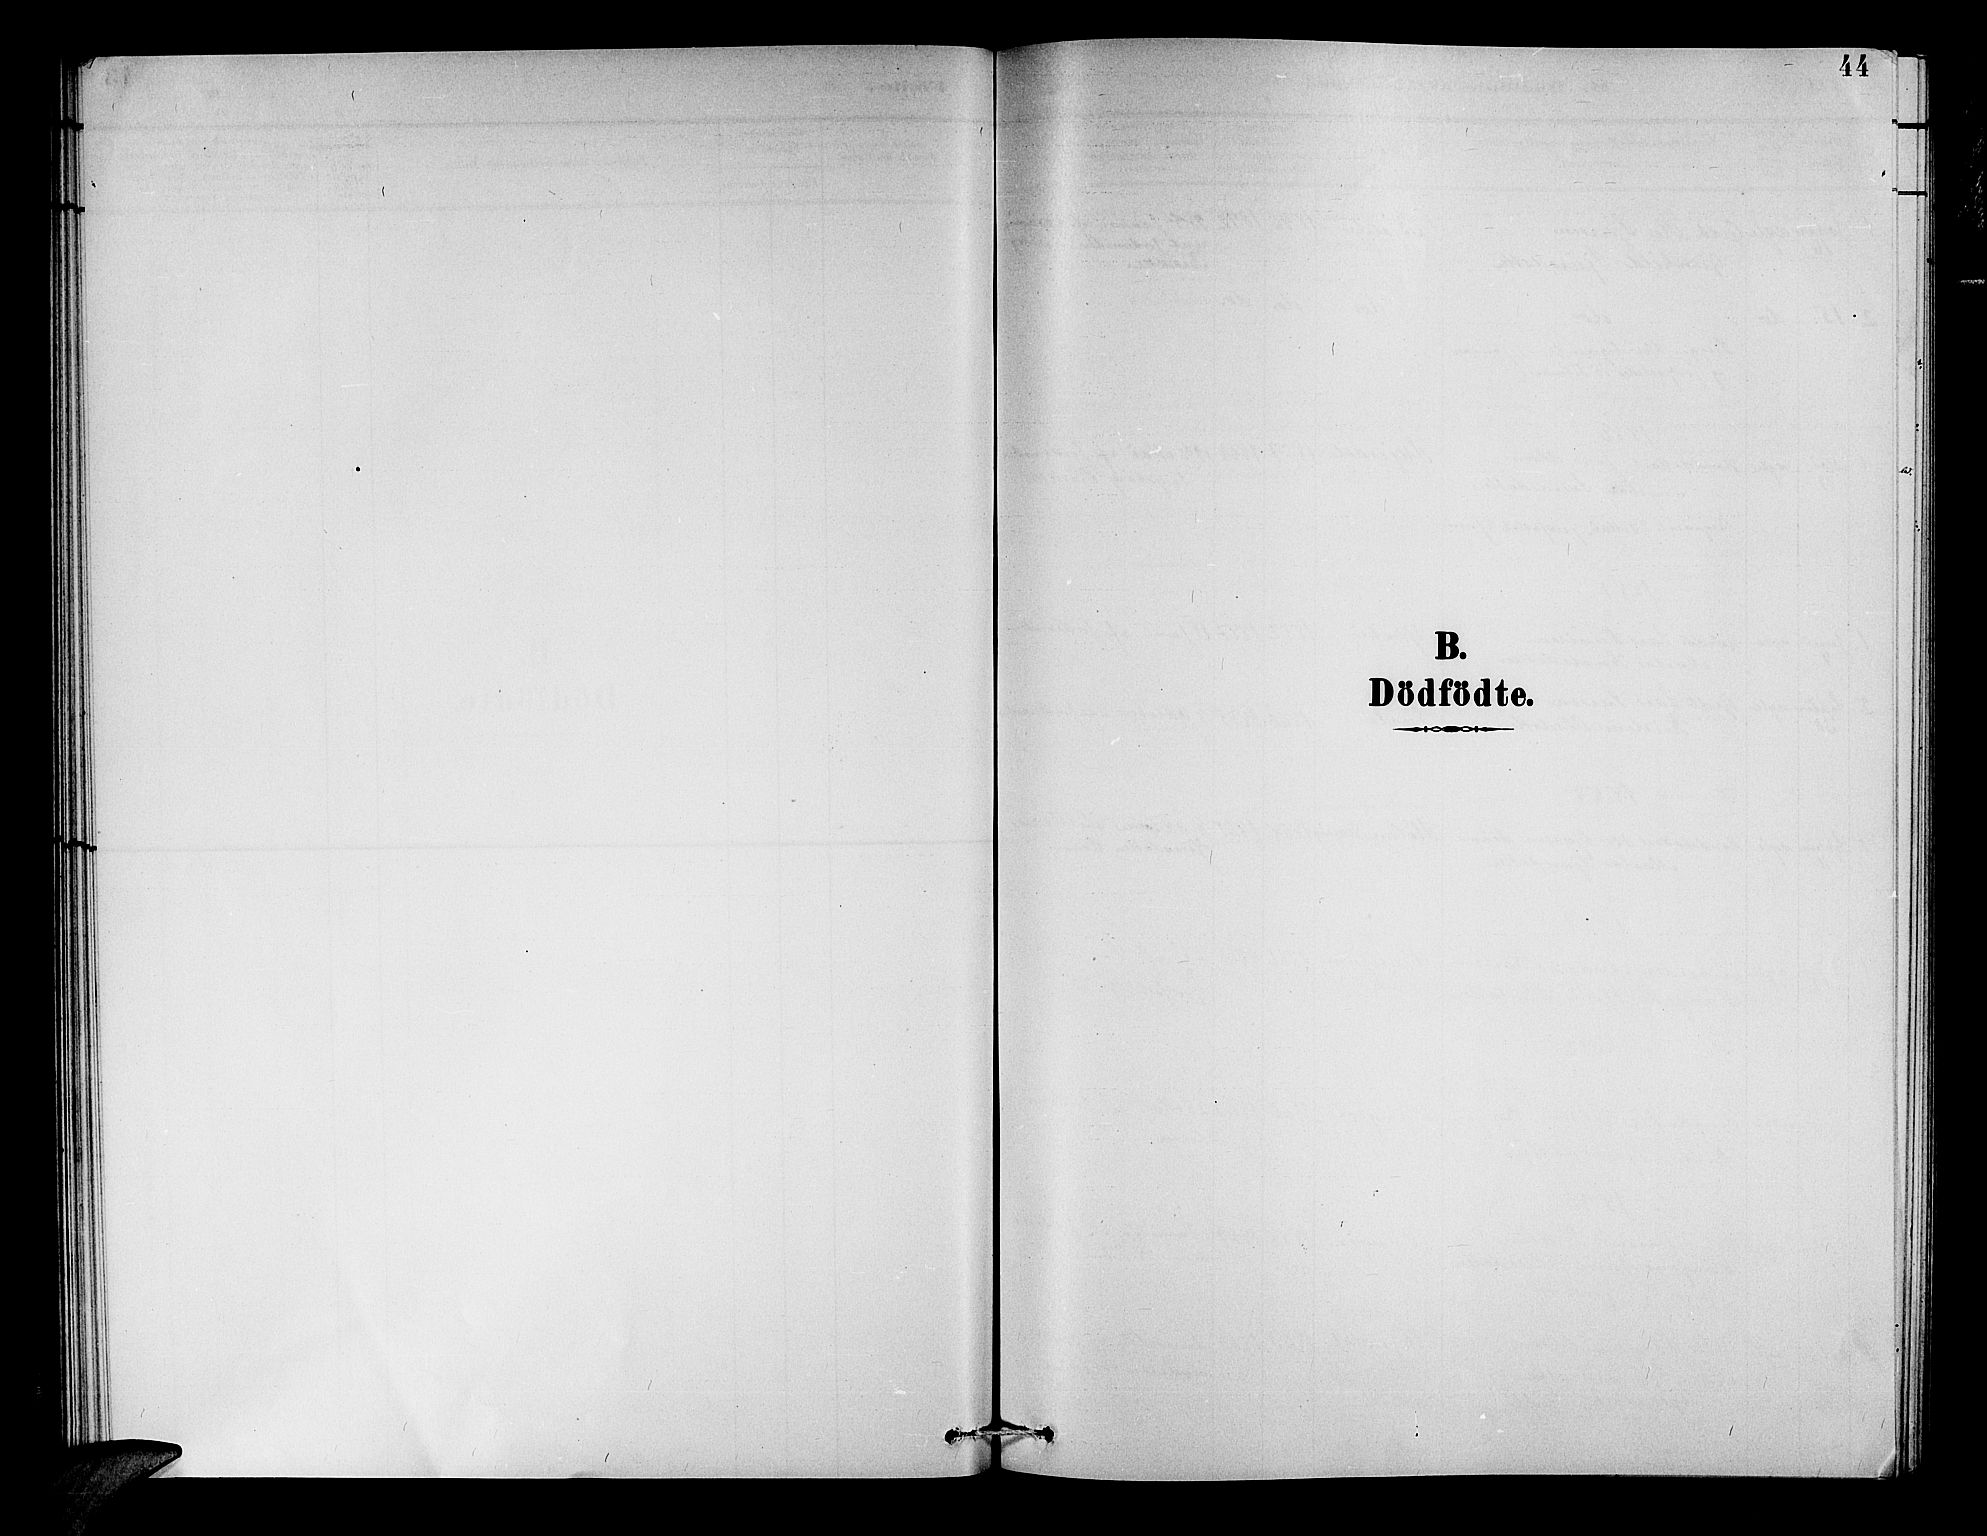 SAB, Aurland Sokneprestembete*, Klokkerbok nr. A 2, 1880-1895, s. 43